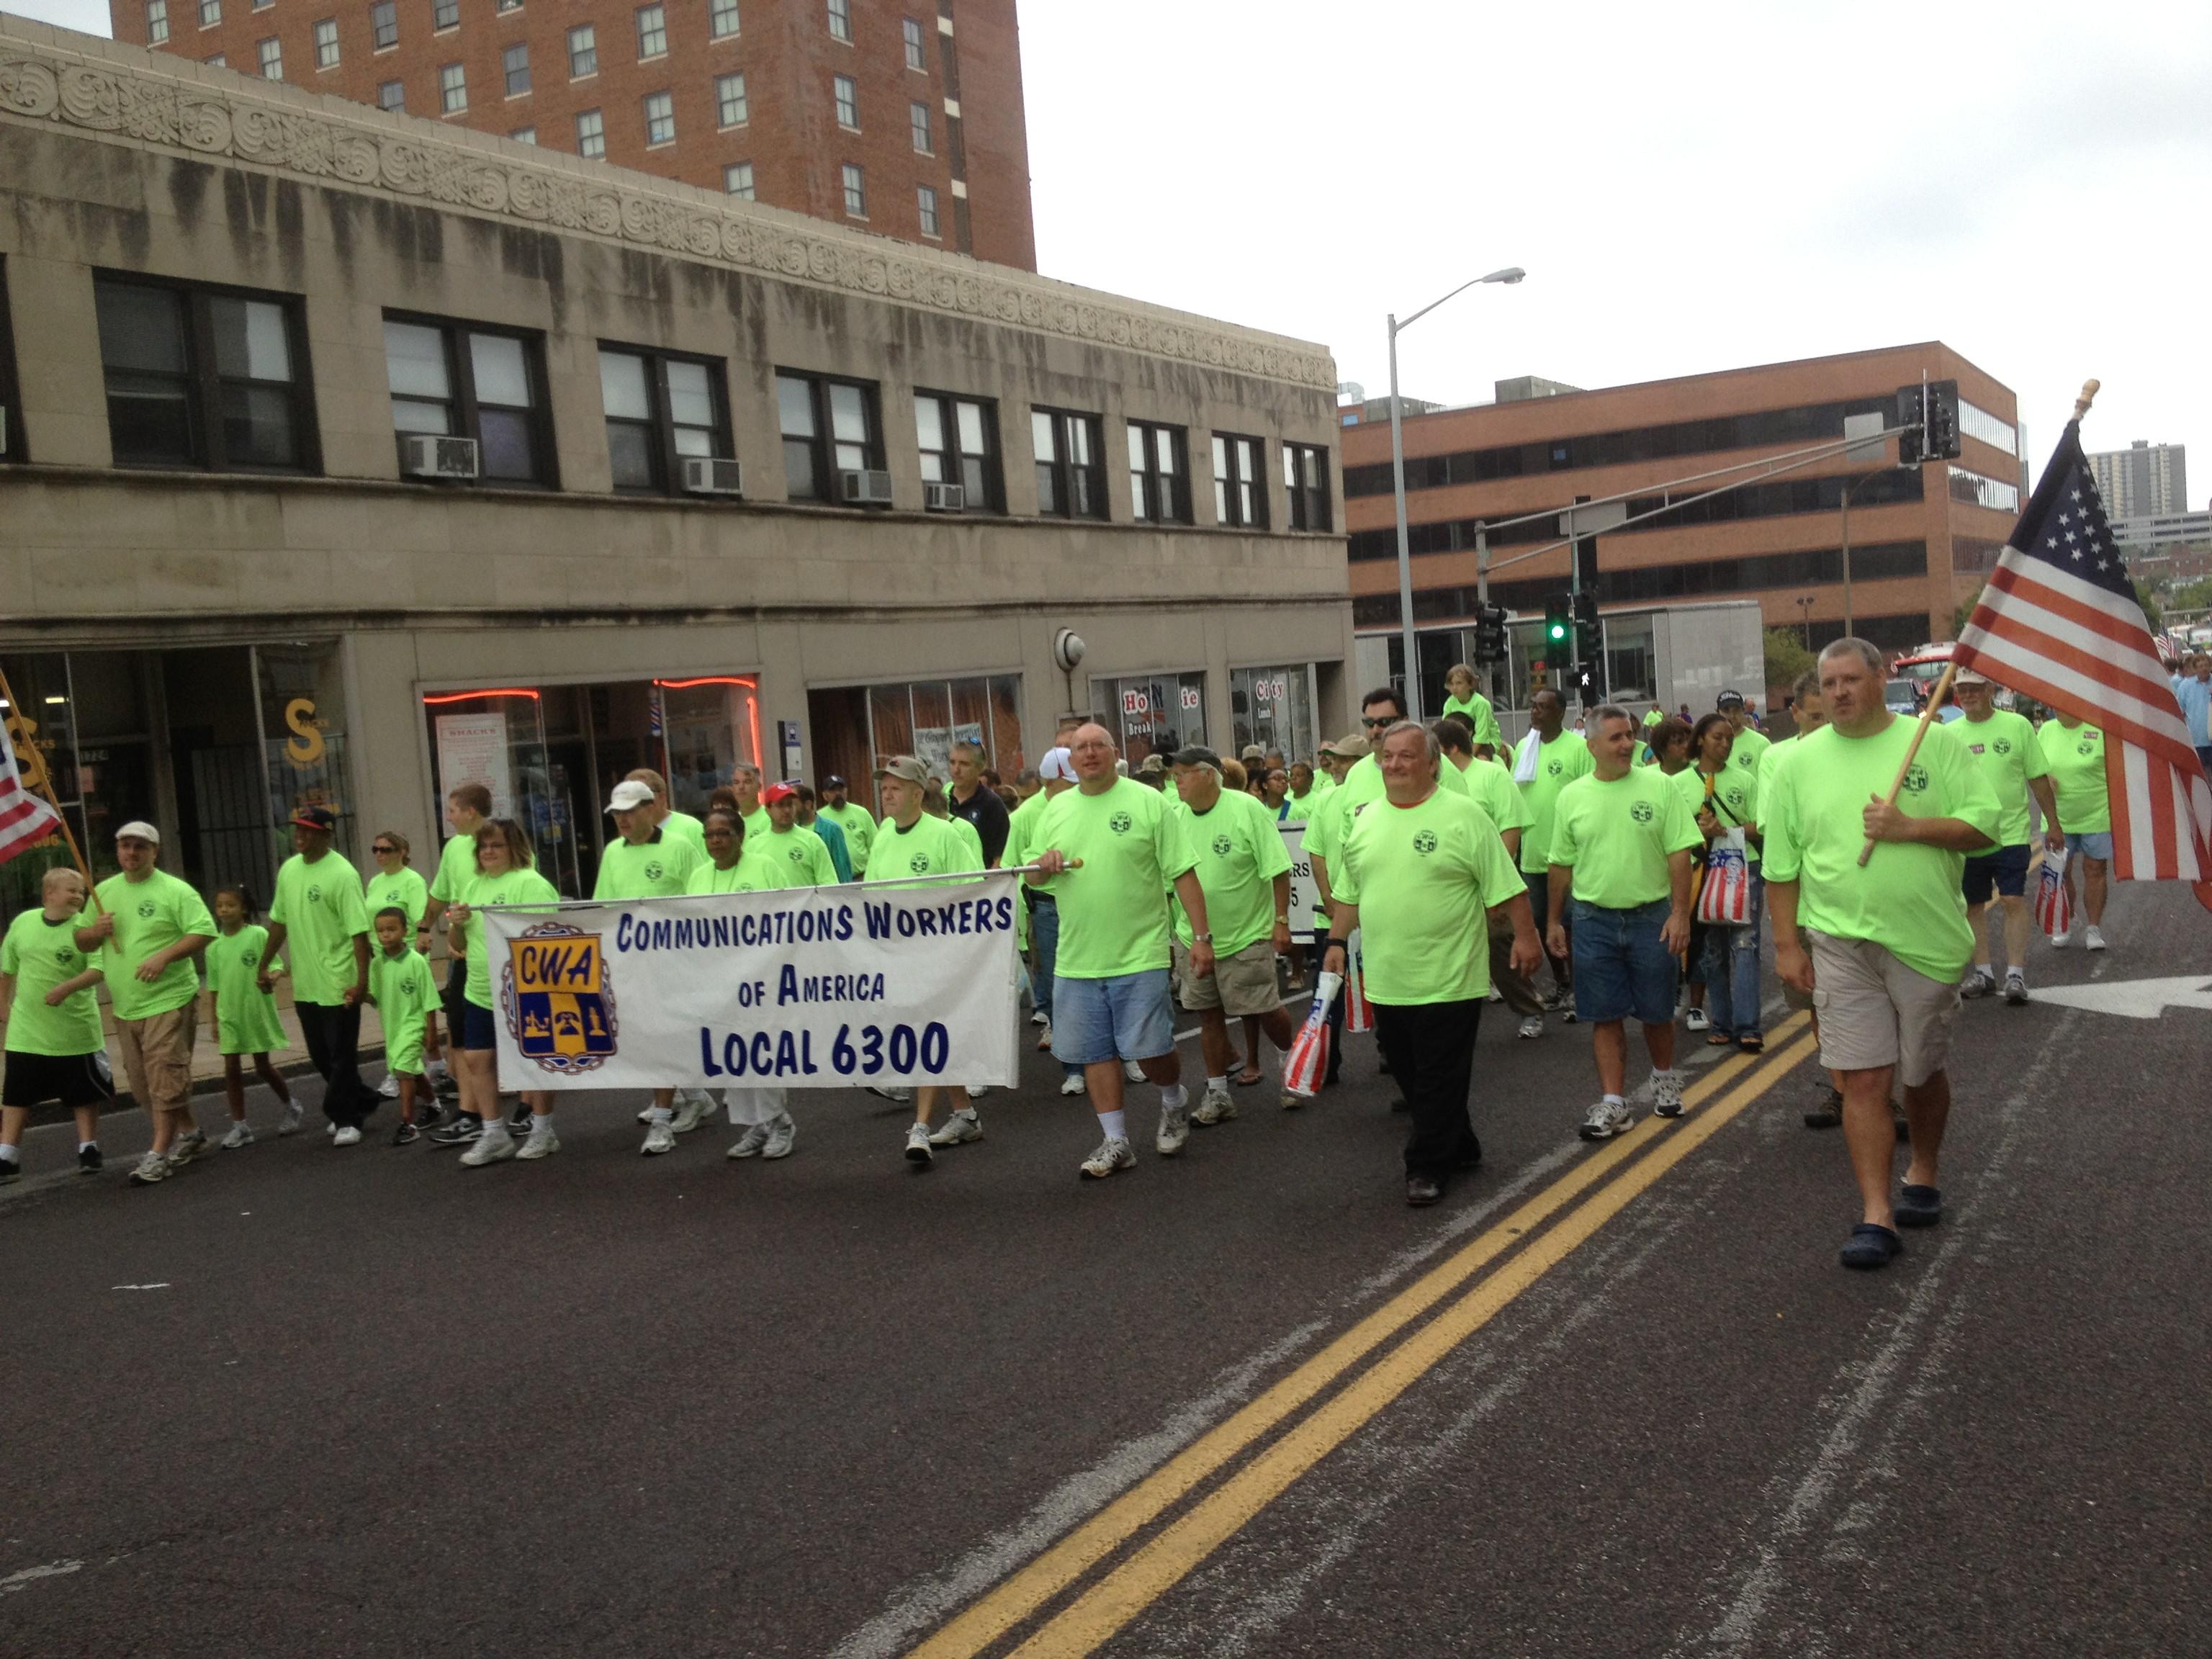 6300 Labor Day 2012